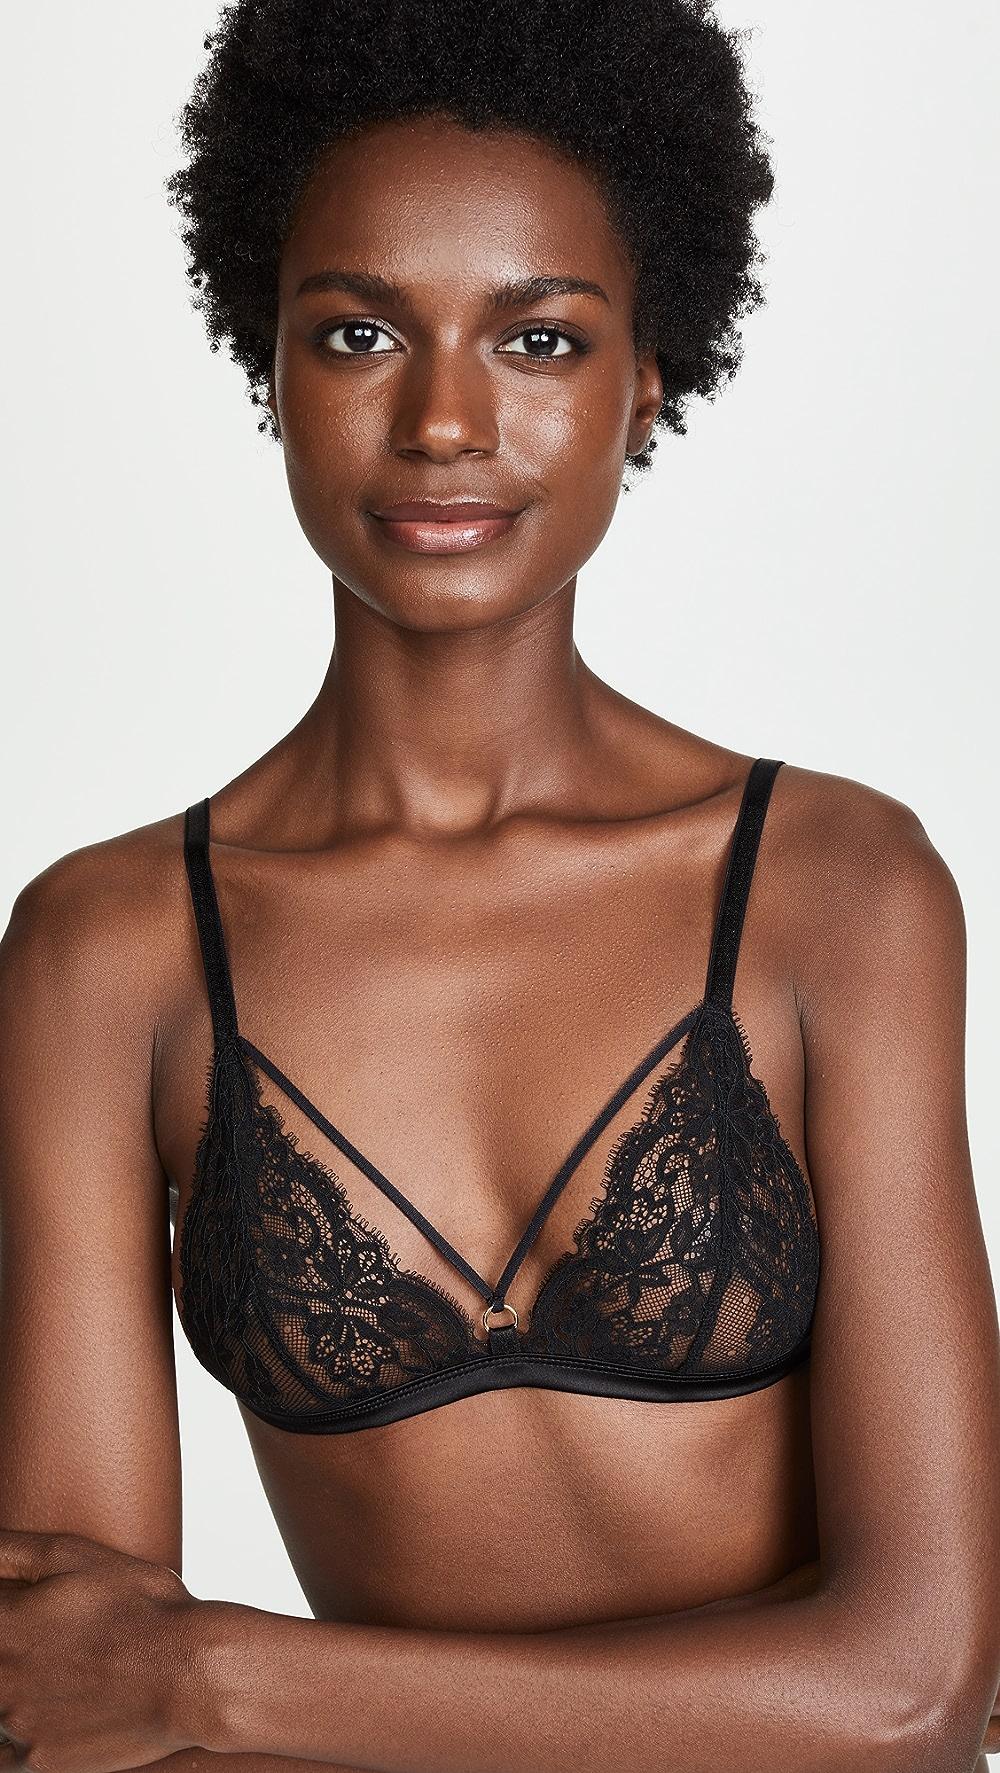 2019 New Style Coco De Mer - Seraphine Triangle Bra Good Reputation Over The World